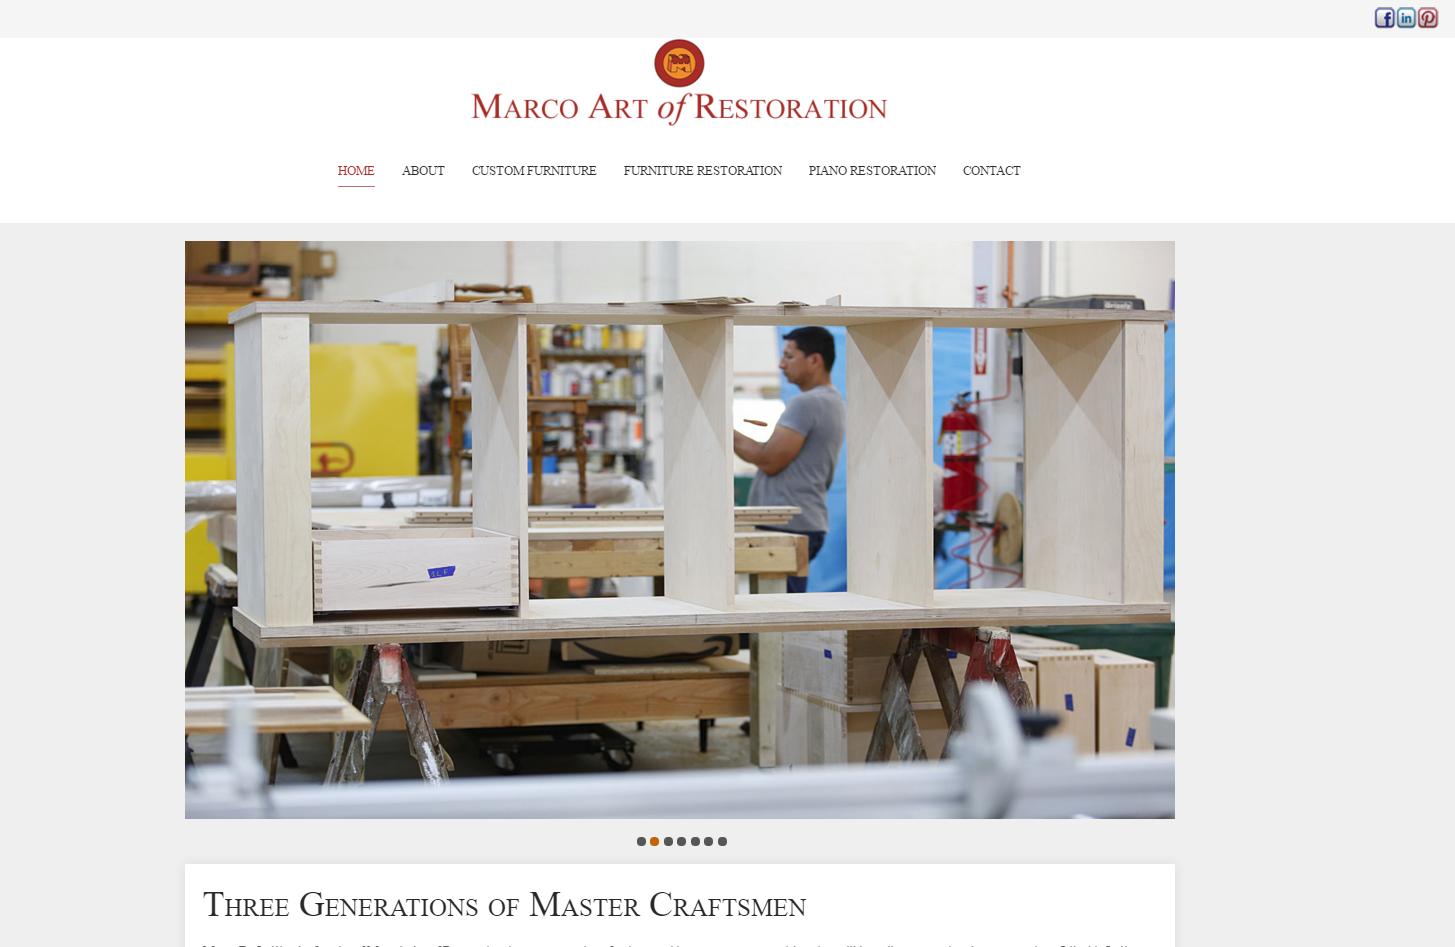 Marco Art of Restoration